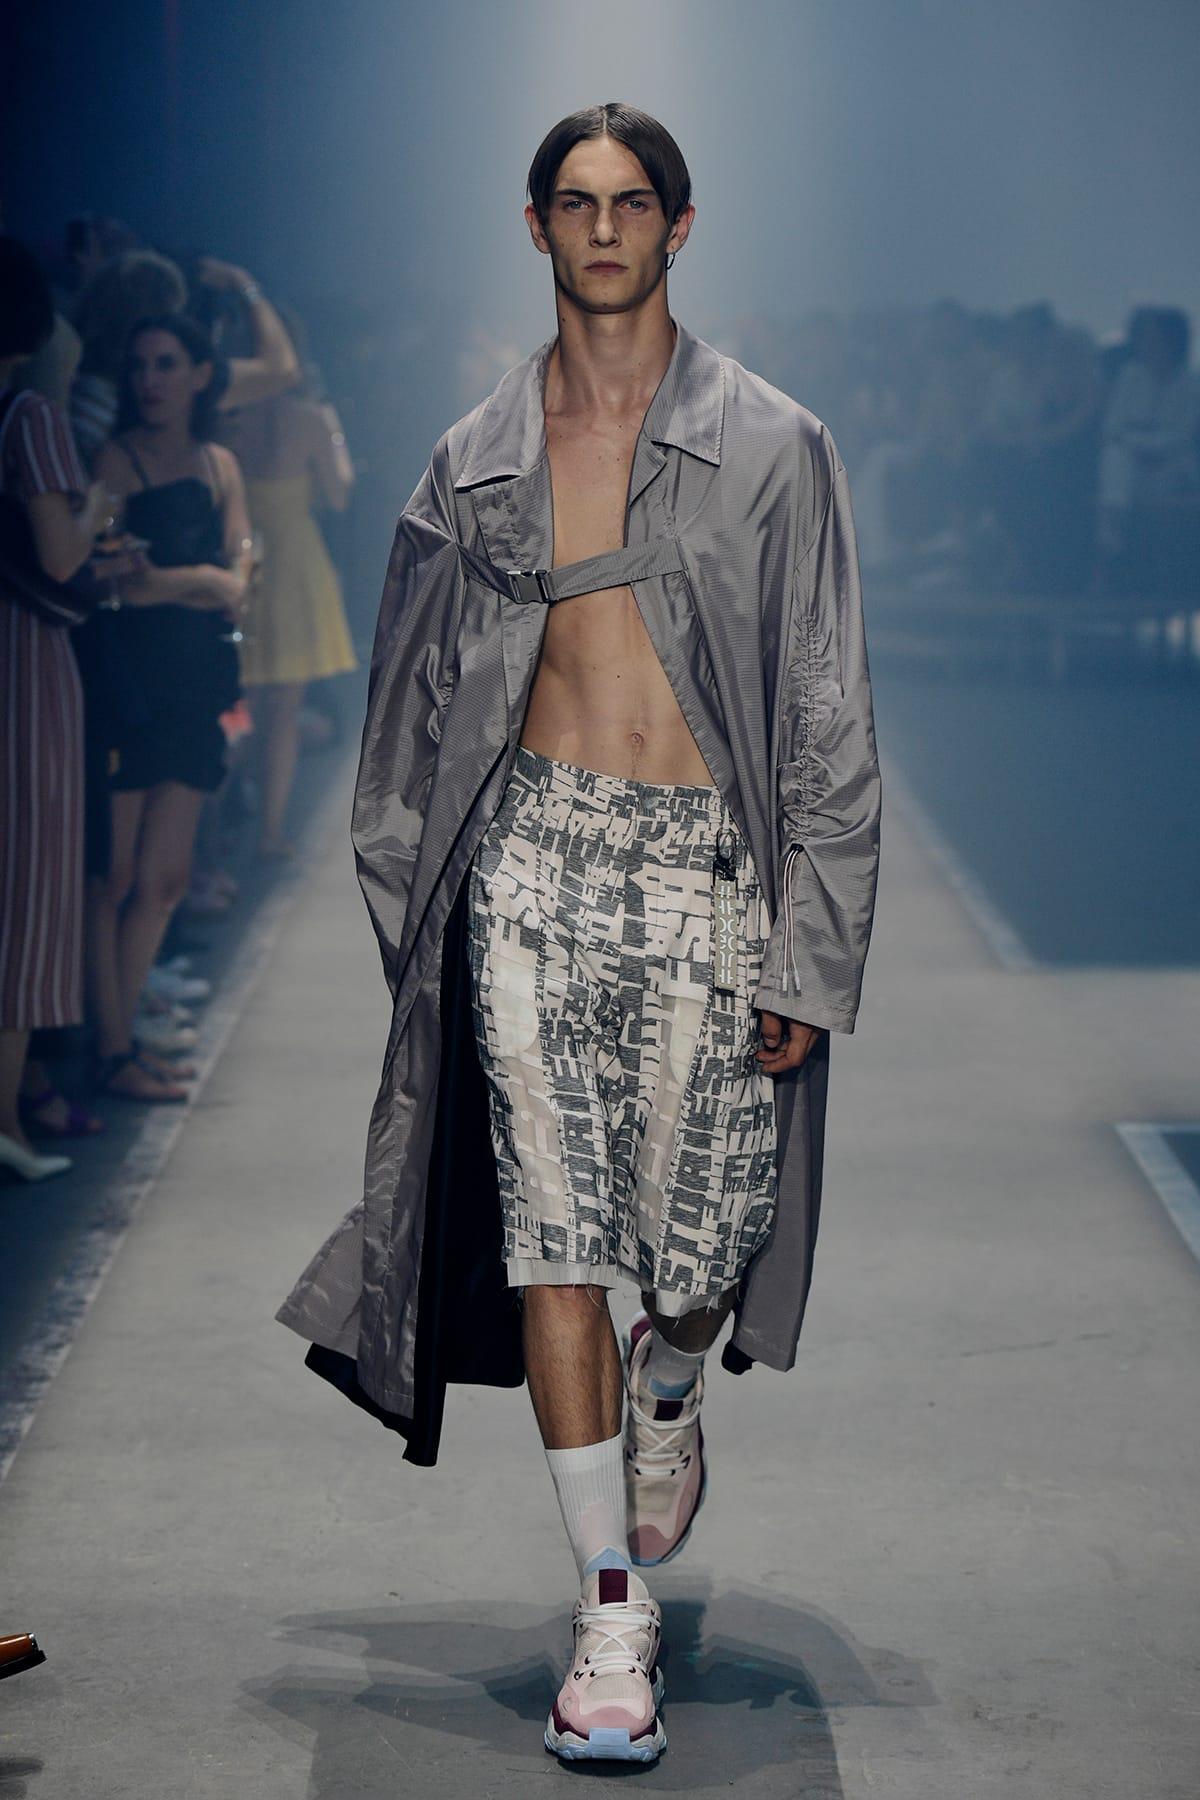 Hugo Boss SpringSummer 2019 Collection – New York Fashion Week pics